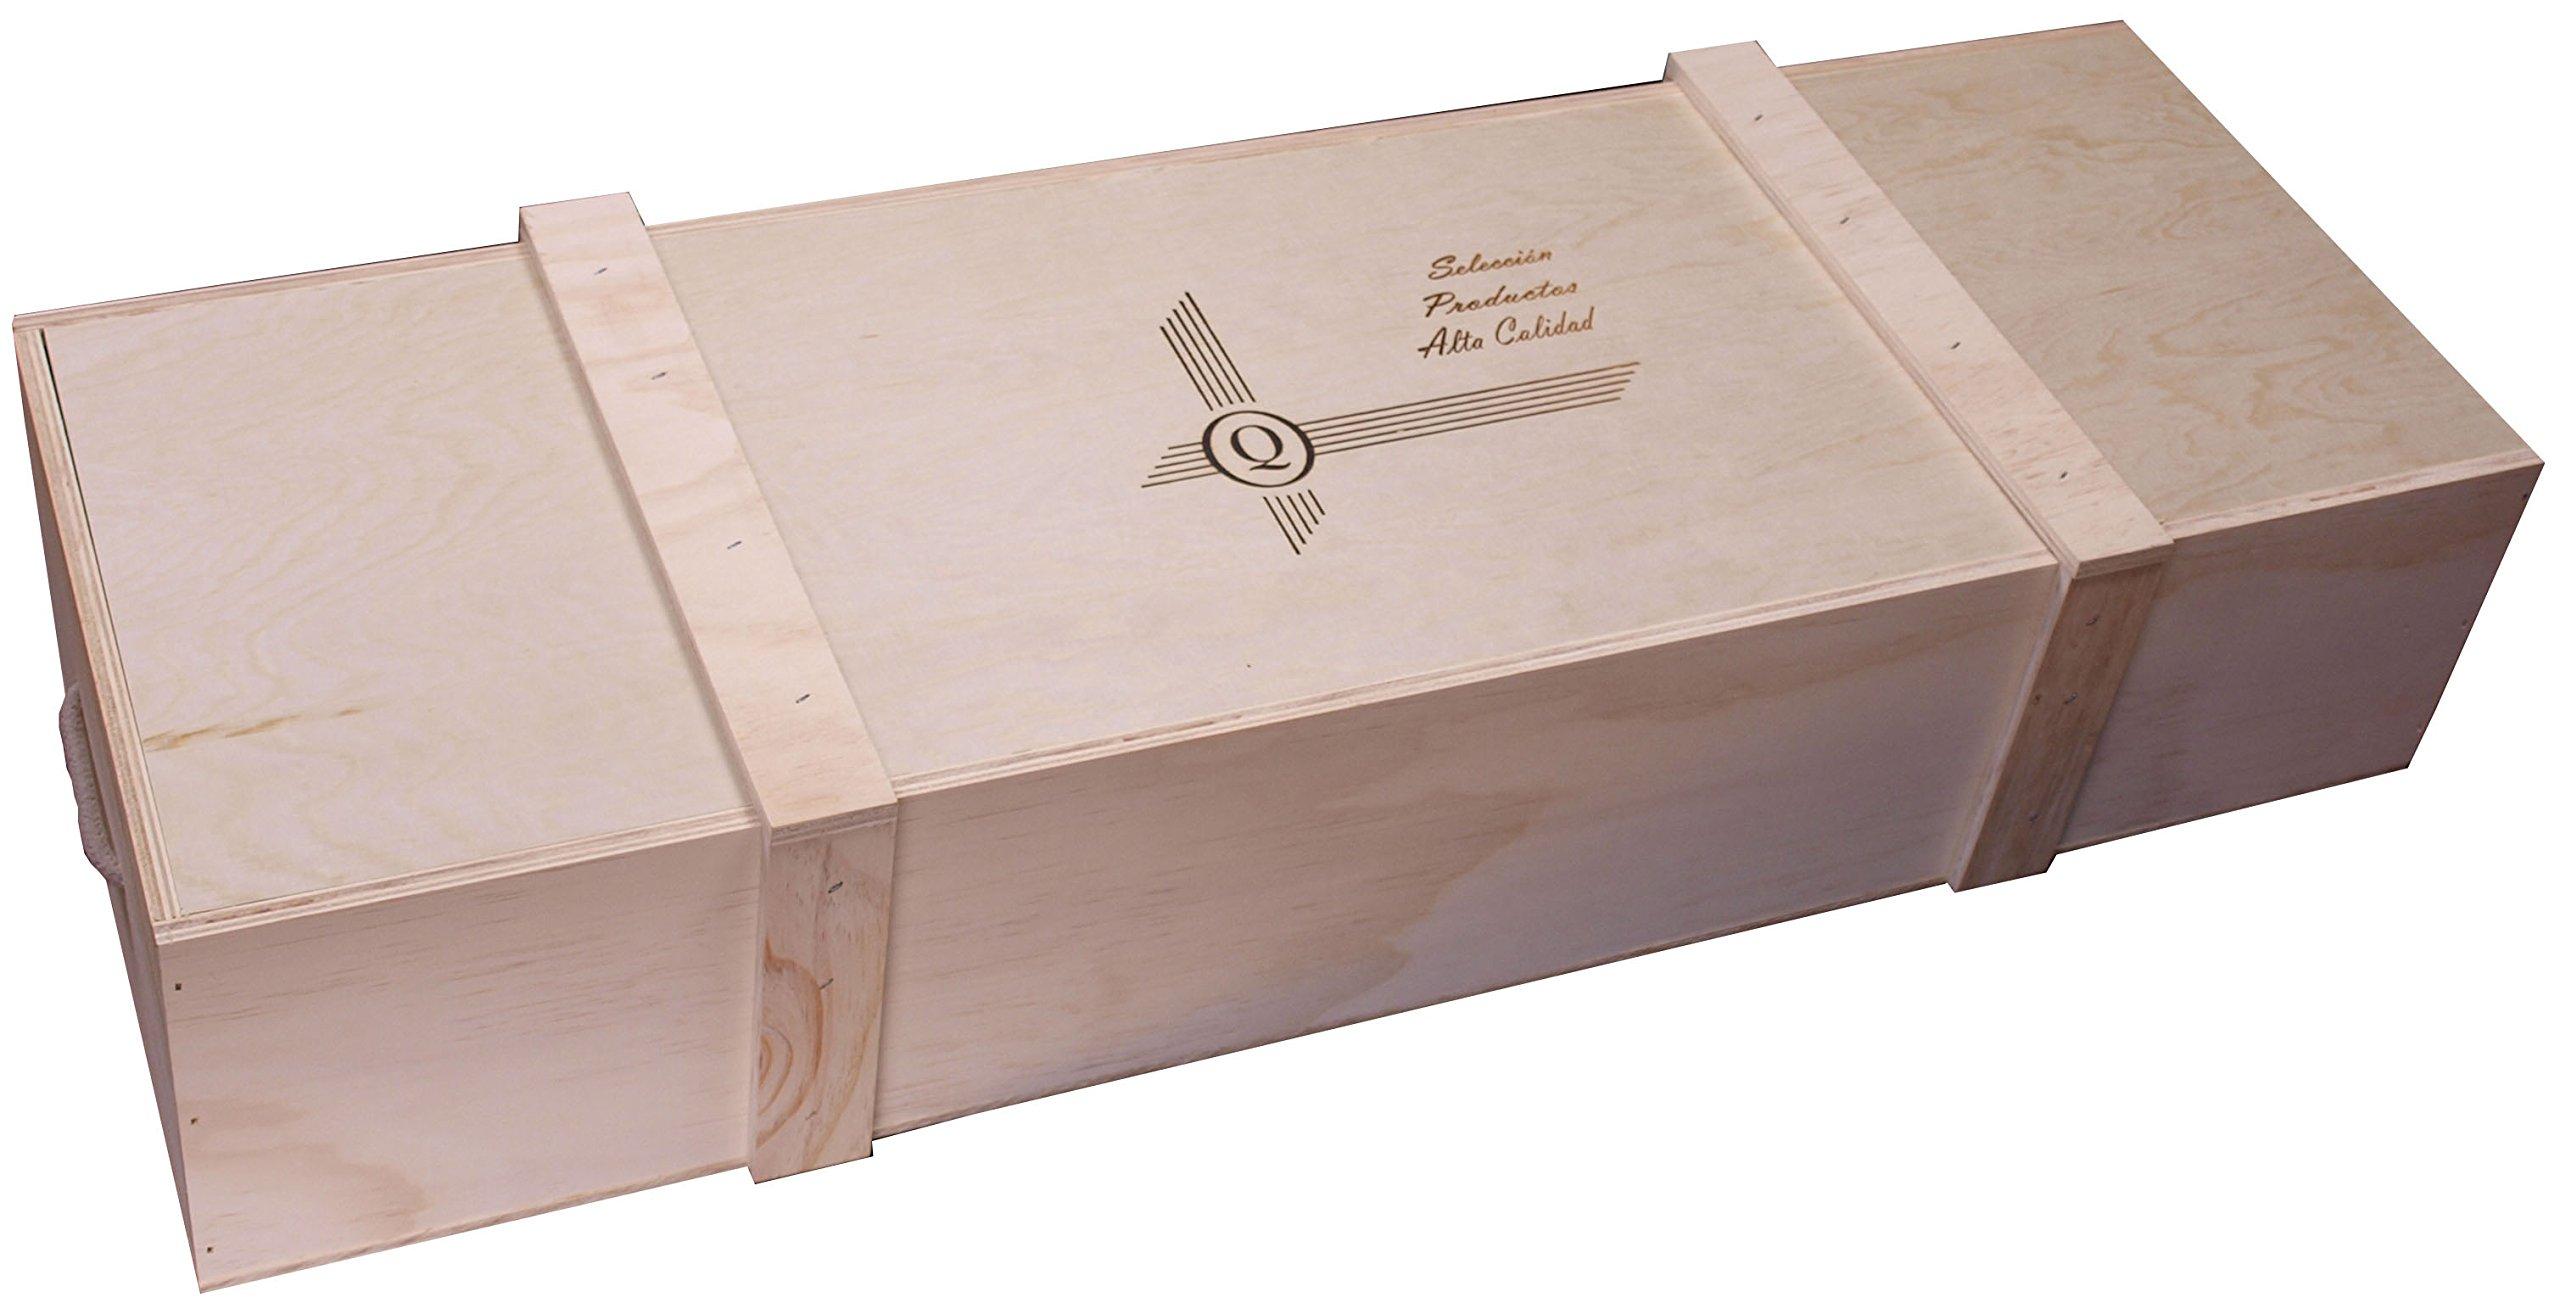 Compra Expovinalia Caja para jamón o Lote, Madera, Blanco, 0.04 cm ...